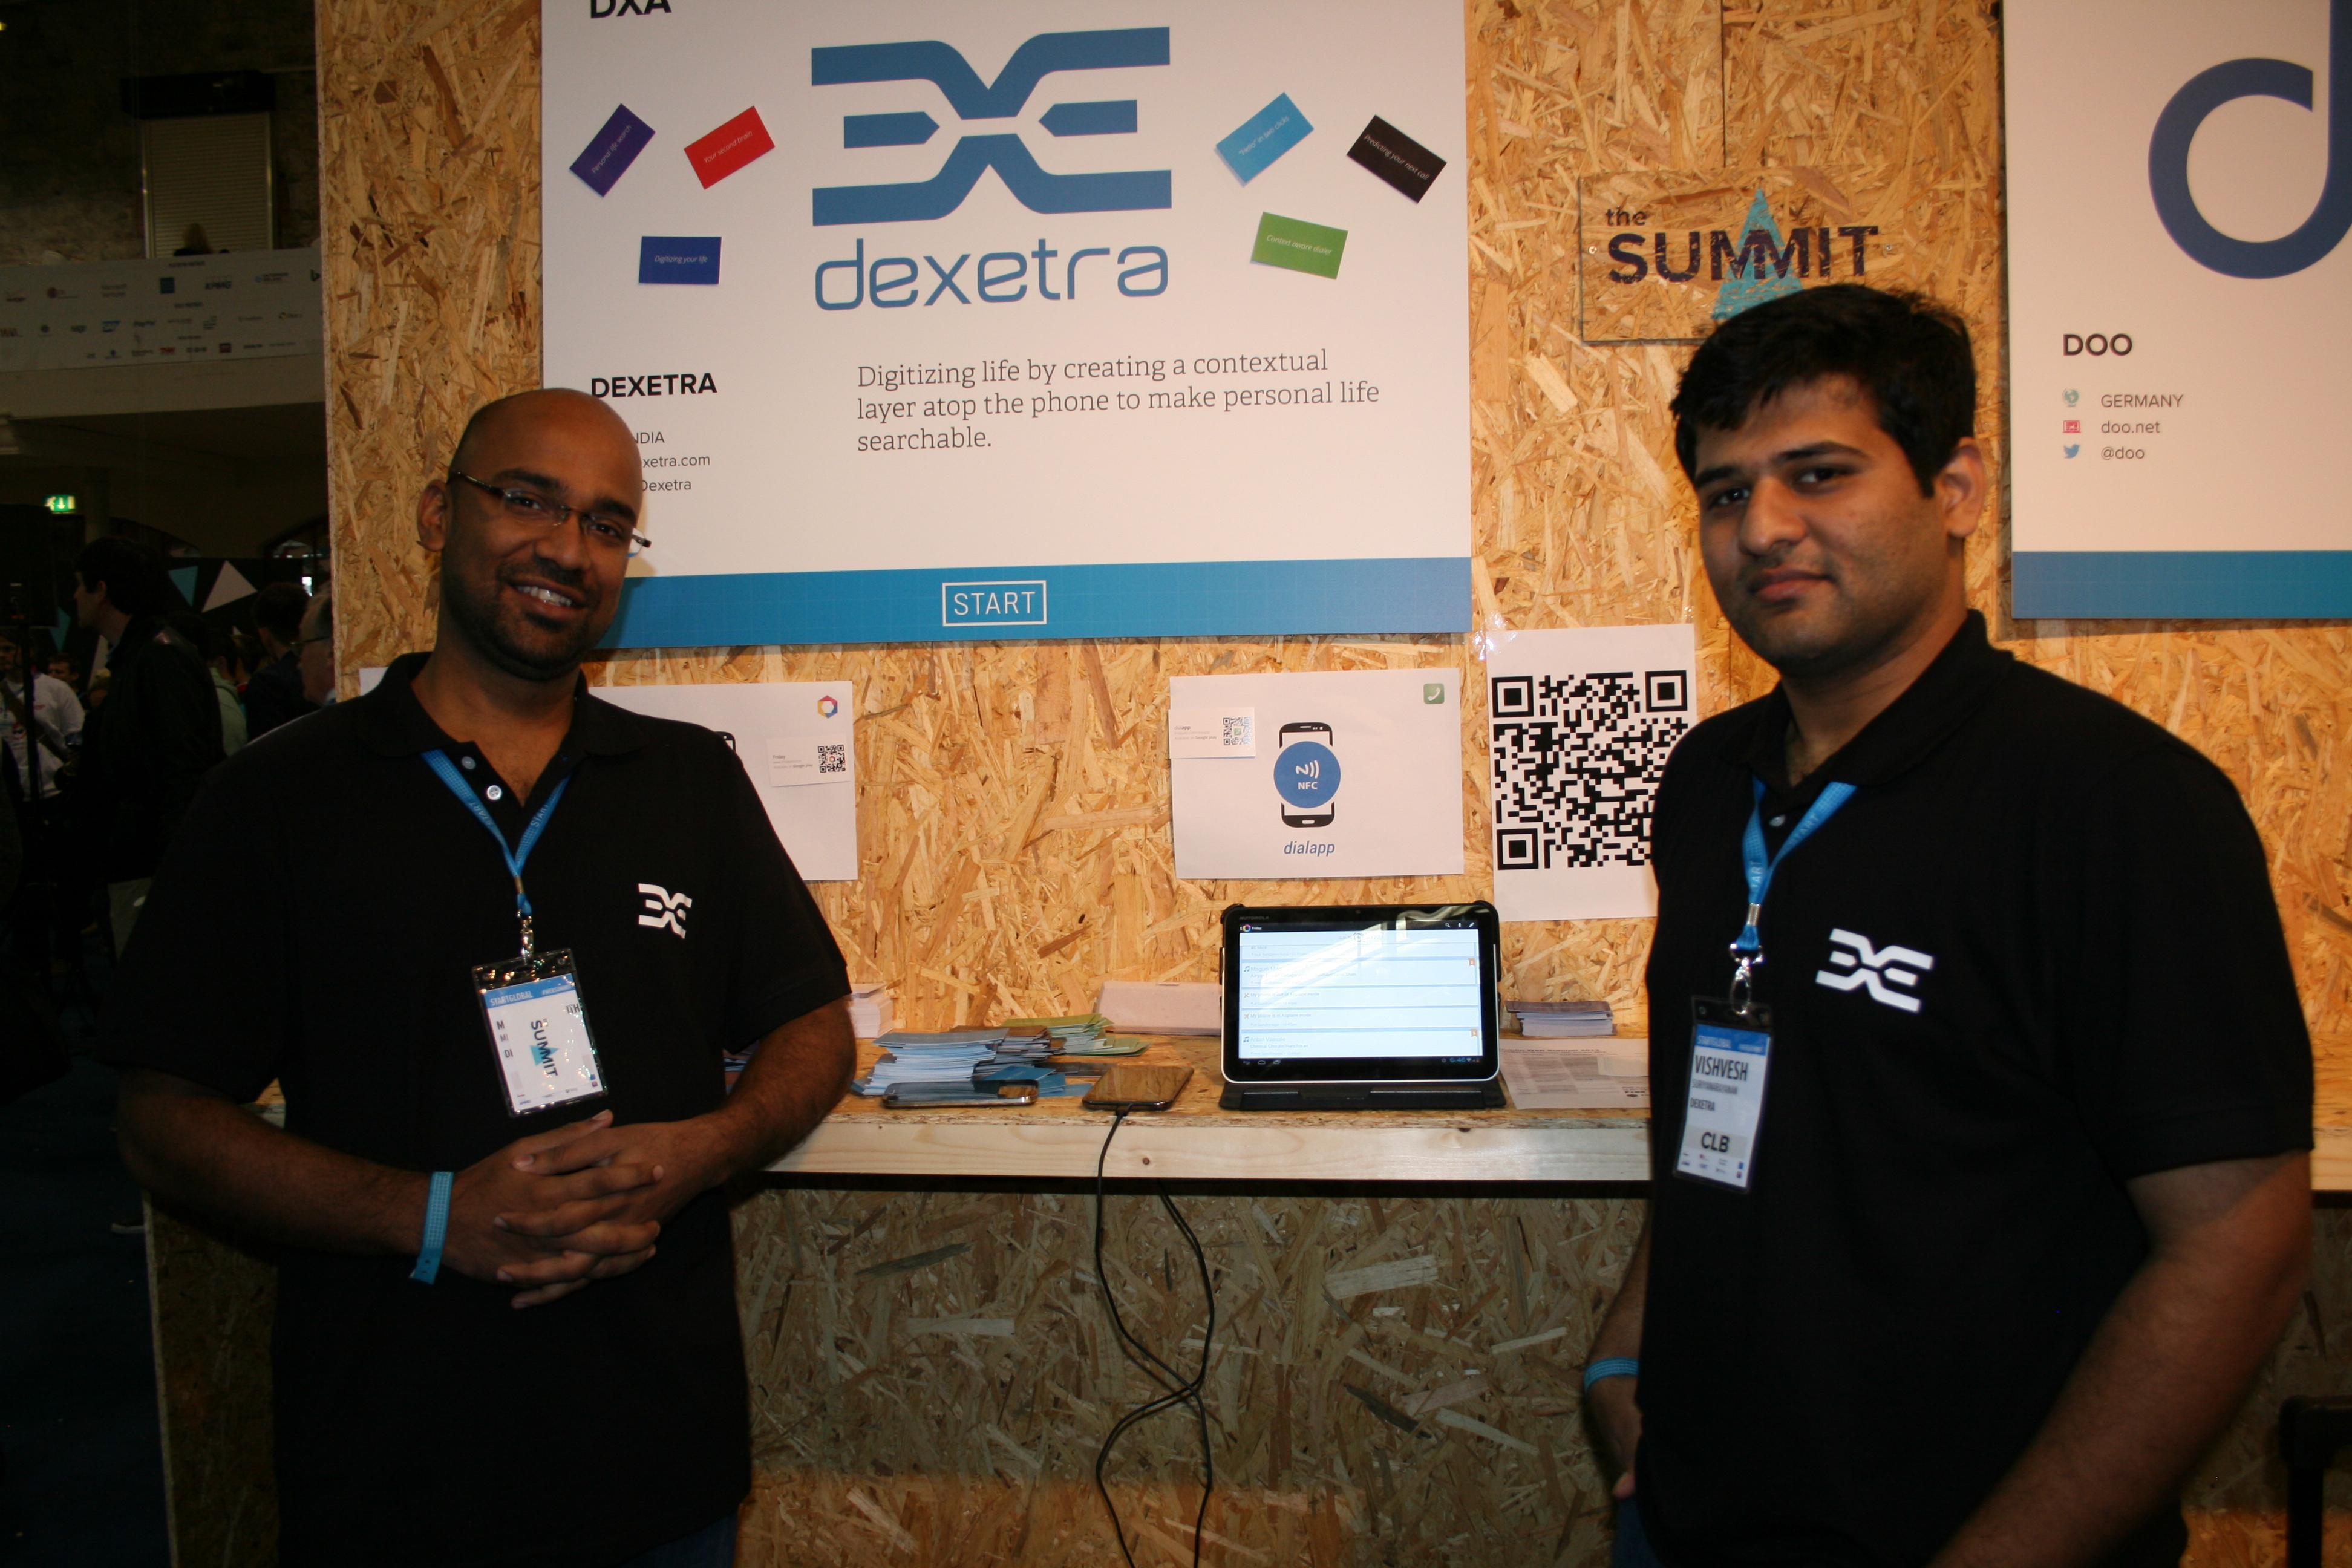 Nettskyutvikler Vishvesh Suriyanarayanan og kollega Binil Antony.